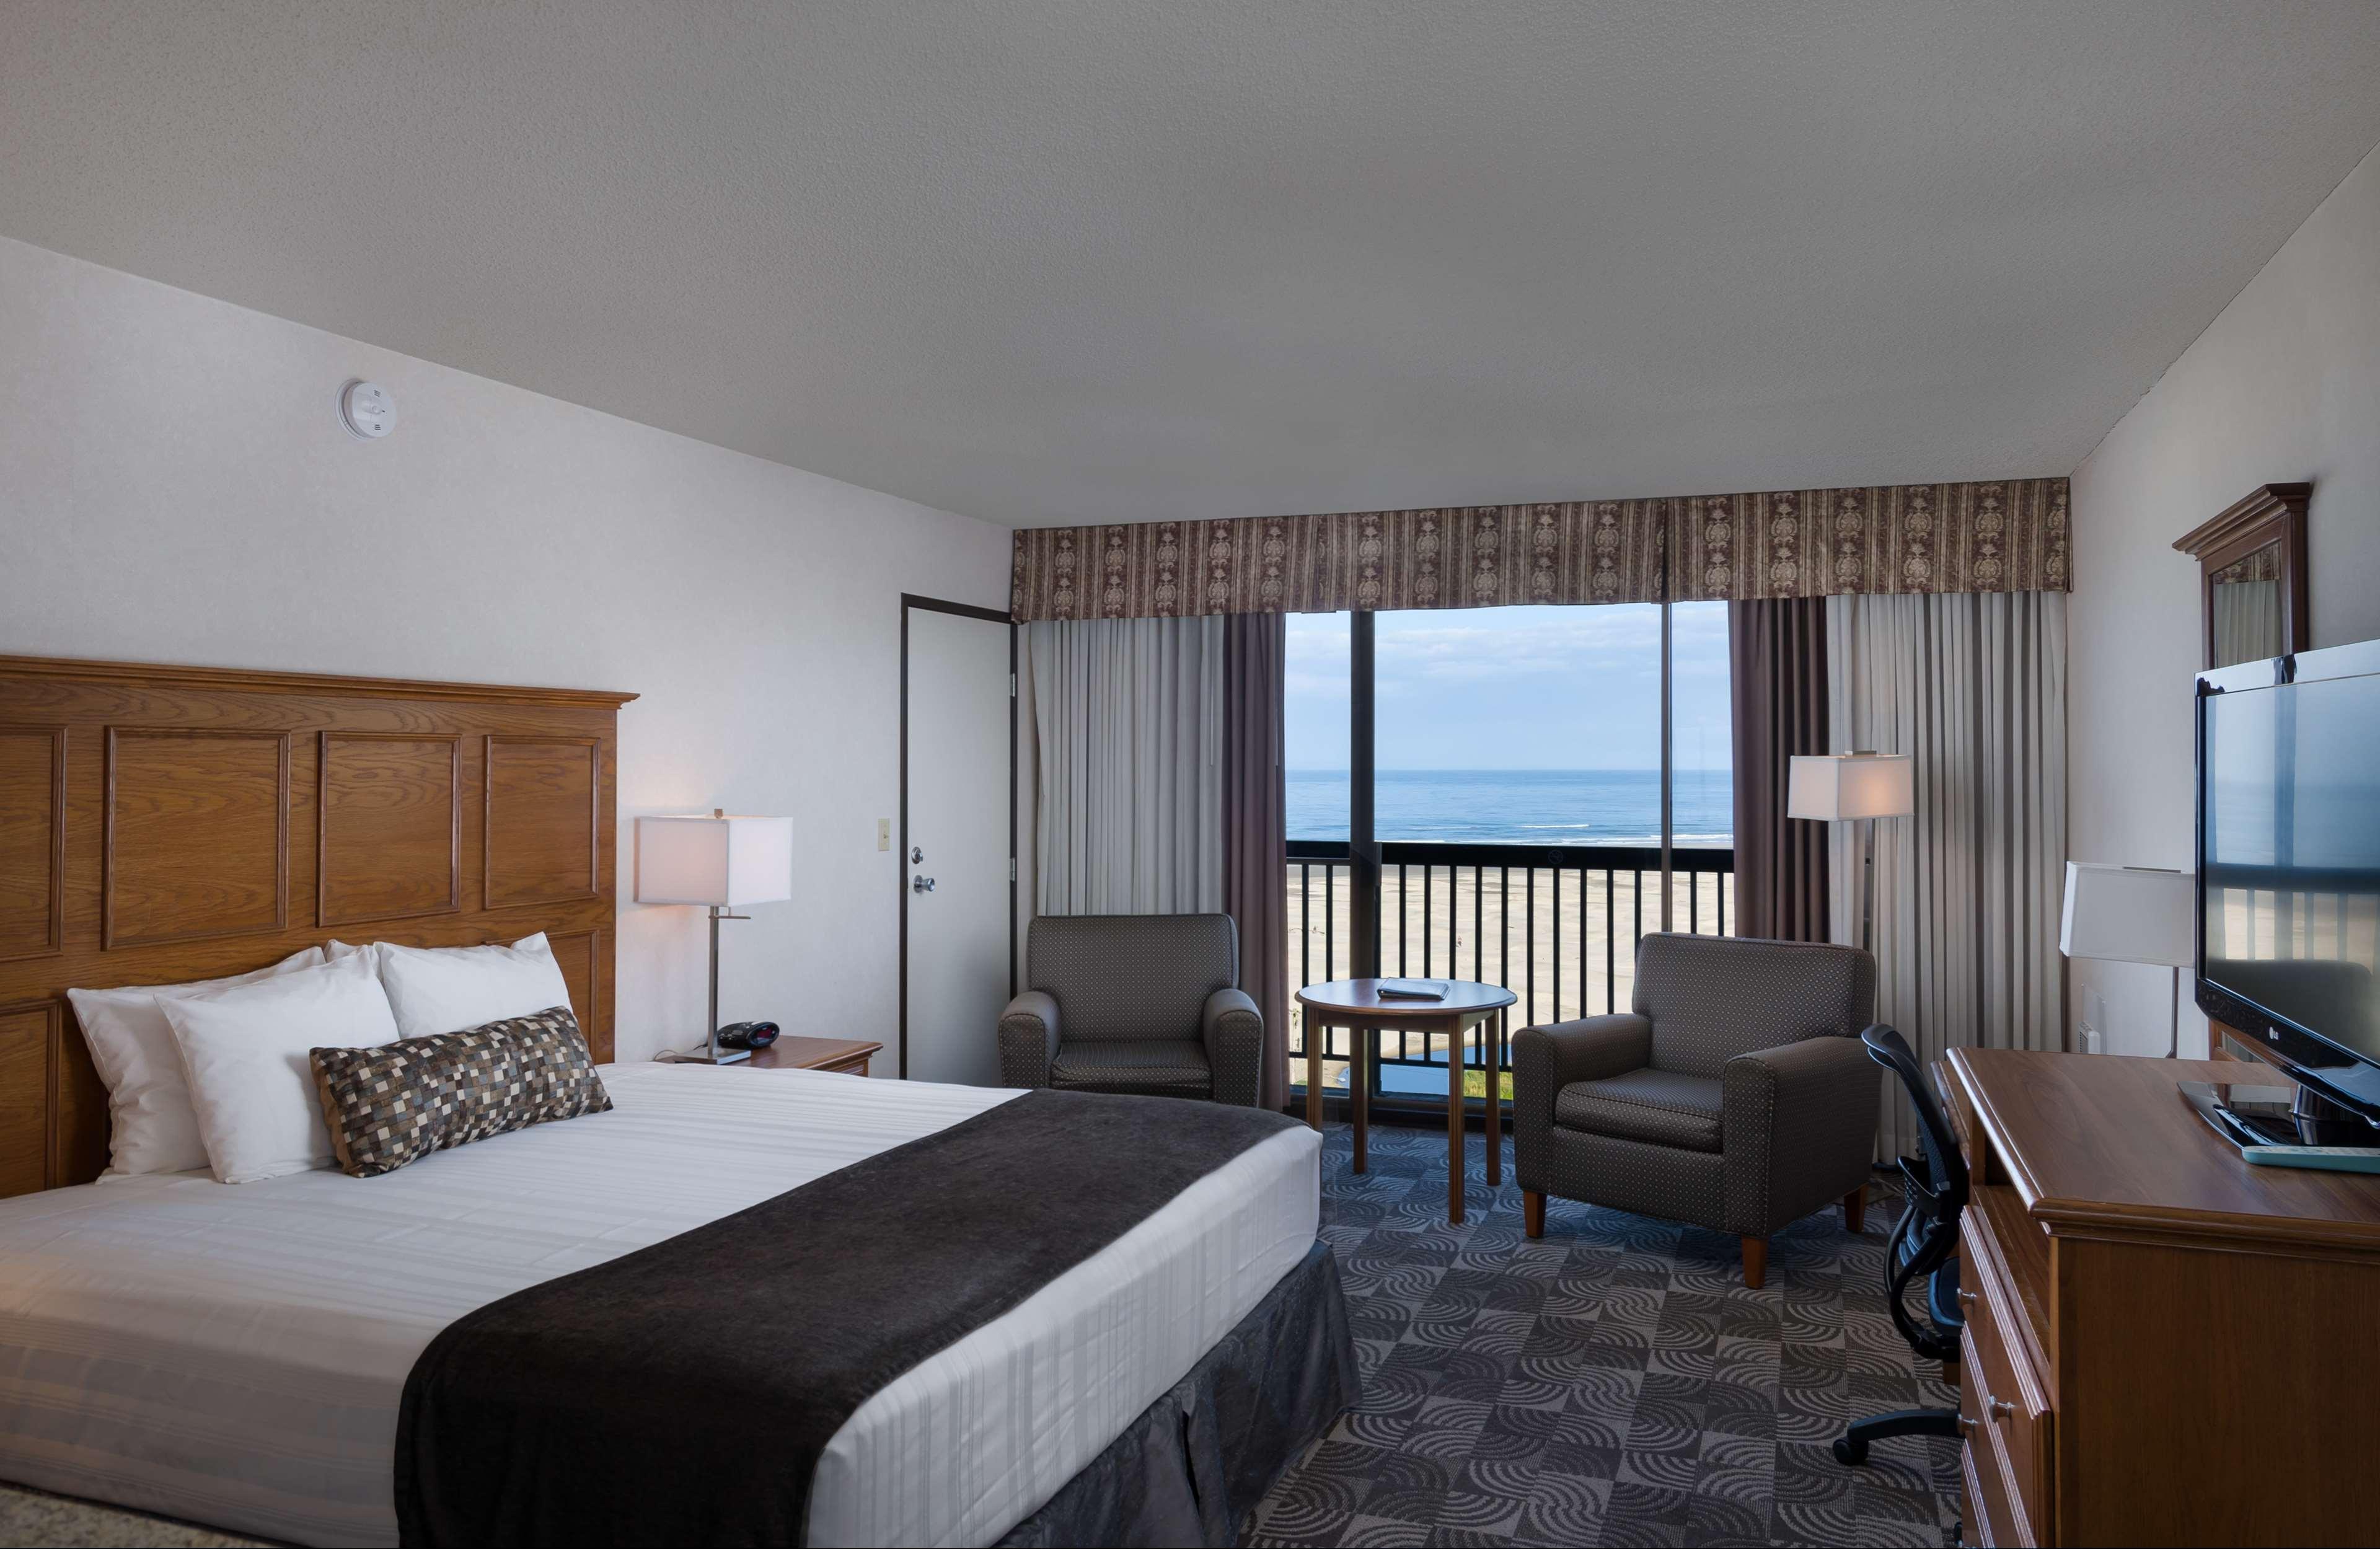 Best Western Agate Beach Inn image 1